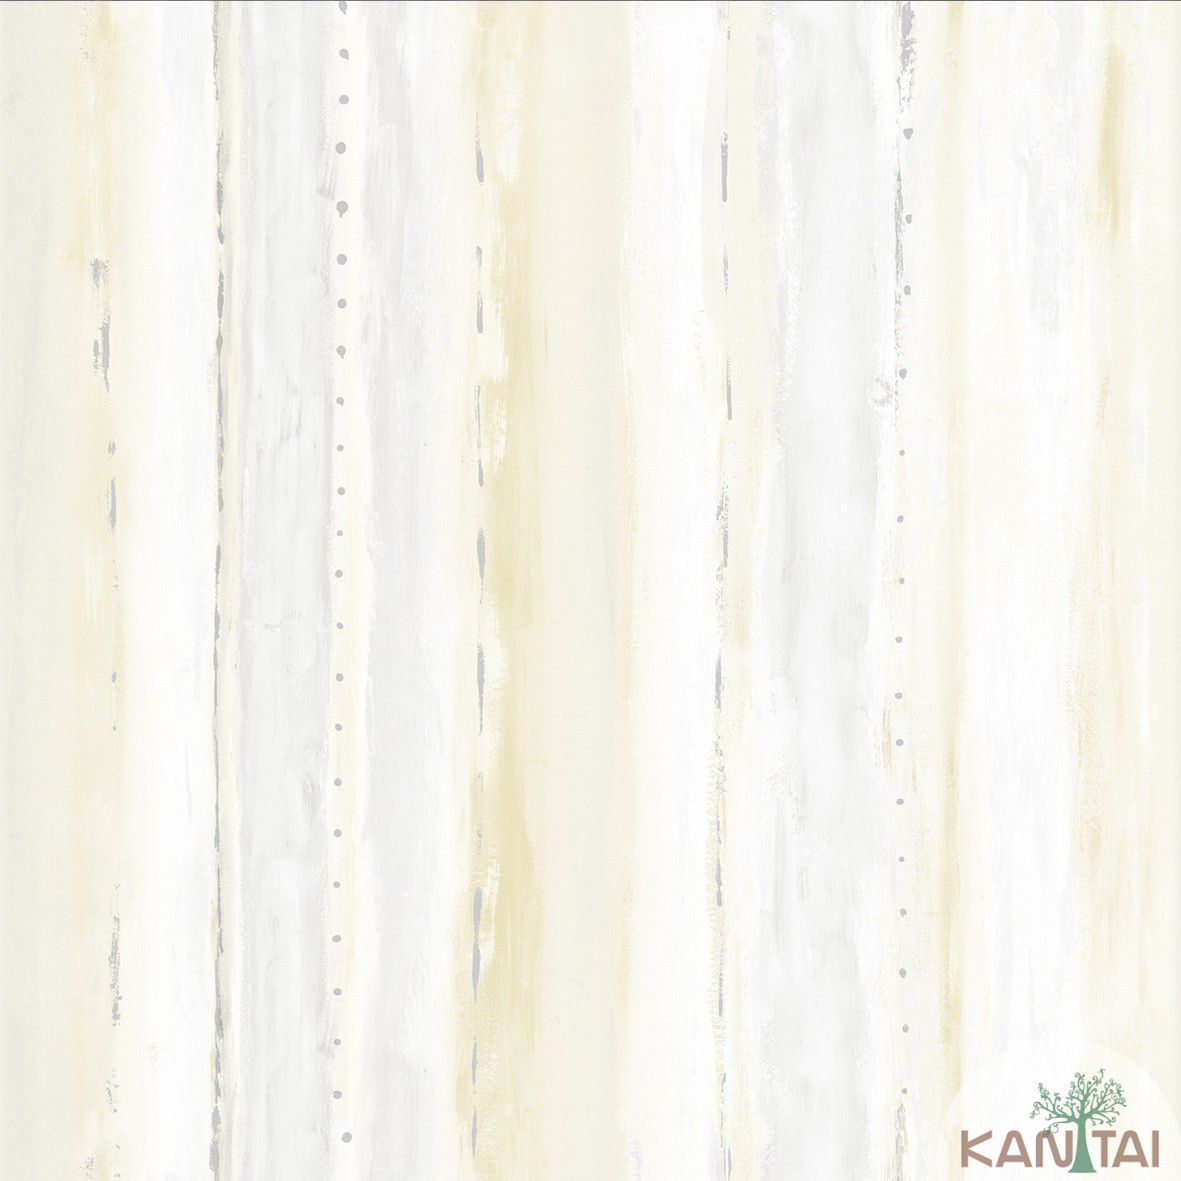 Papel de Parede  Kan Tai Vinilico Coleção Style Textura Cinza, Creme, Amarelo